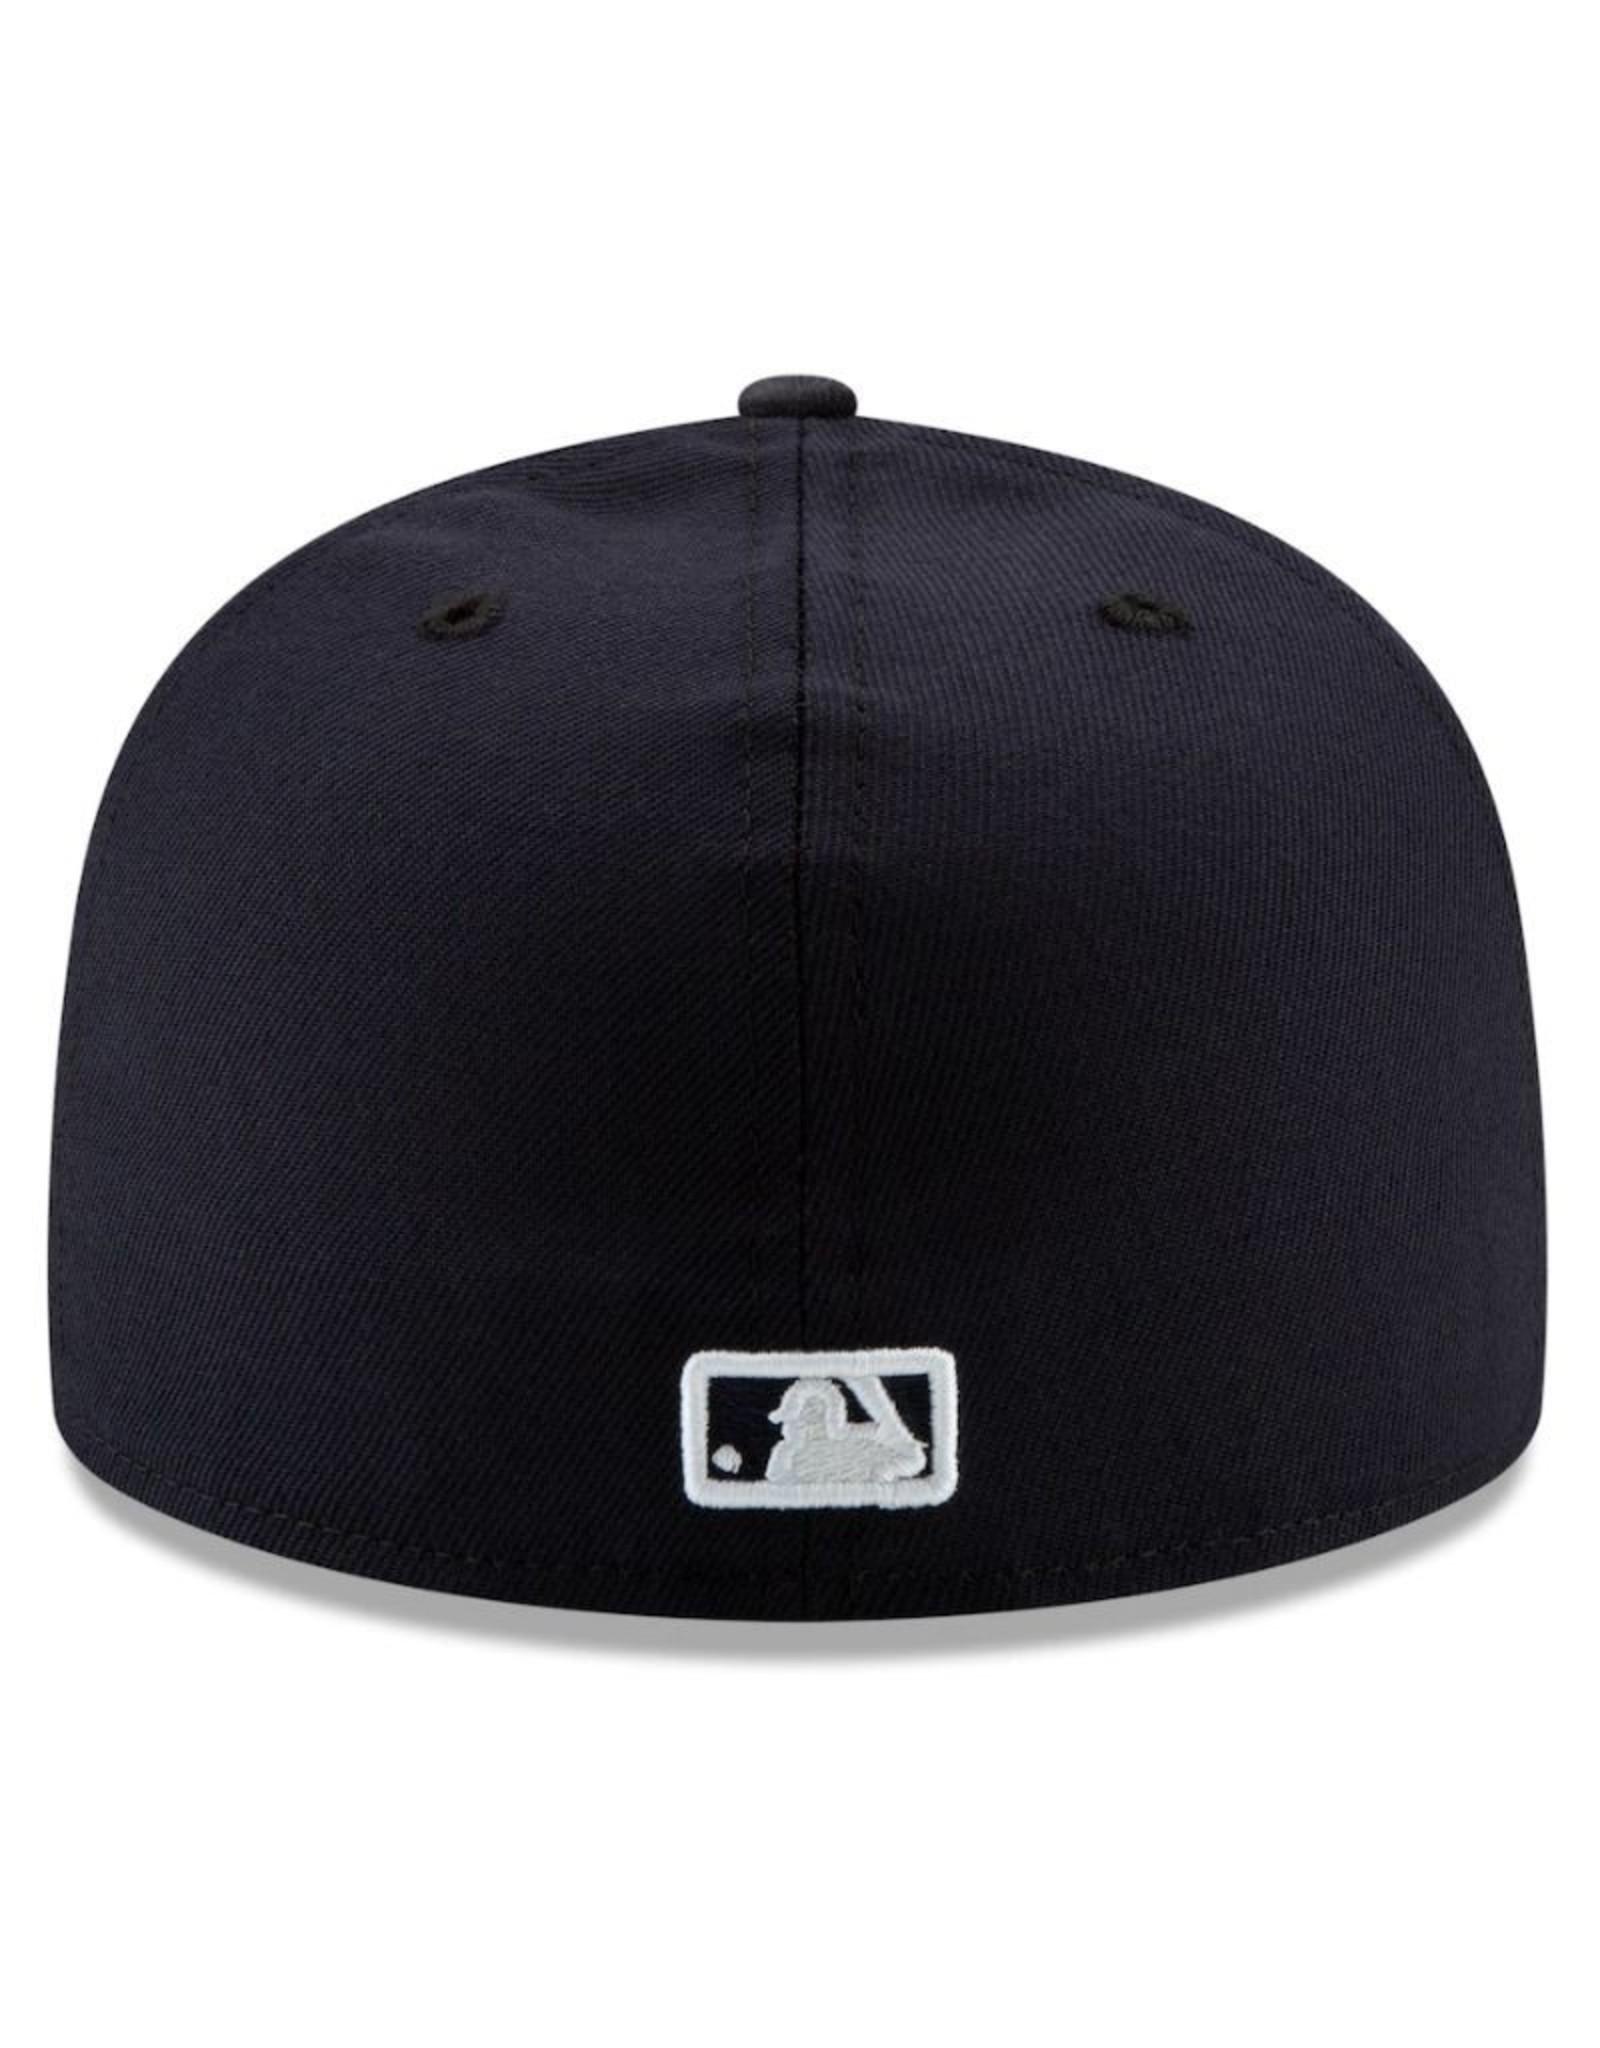 New Era On-Field Home Hat Detroit Tigers Navy